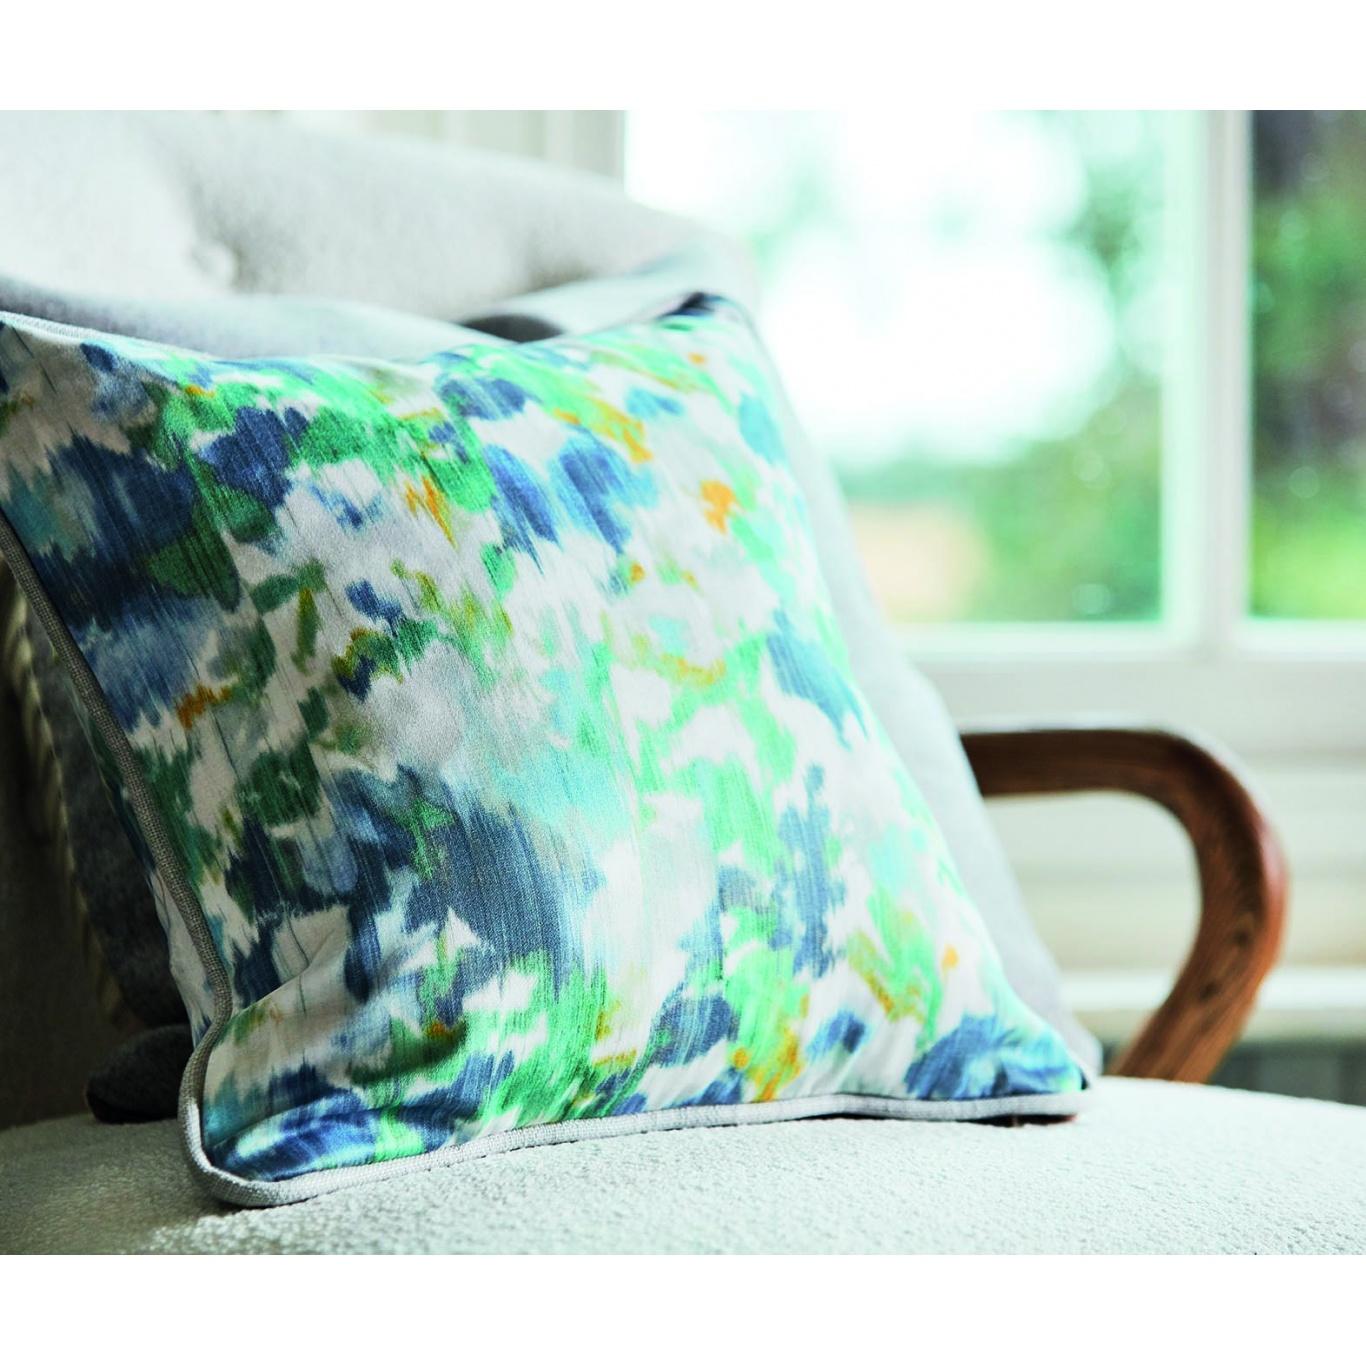 Sanderson Poet's Garden Teal/Indigo Fabric 226756